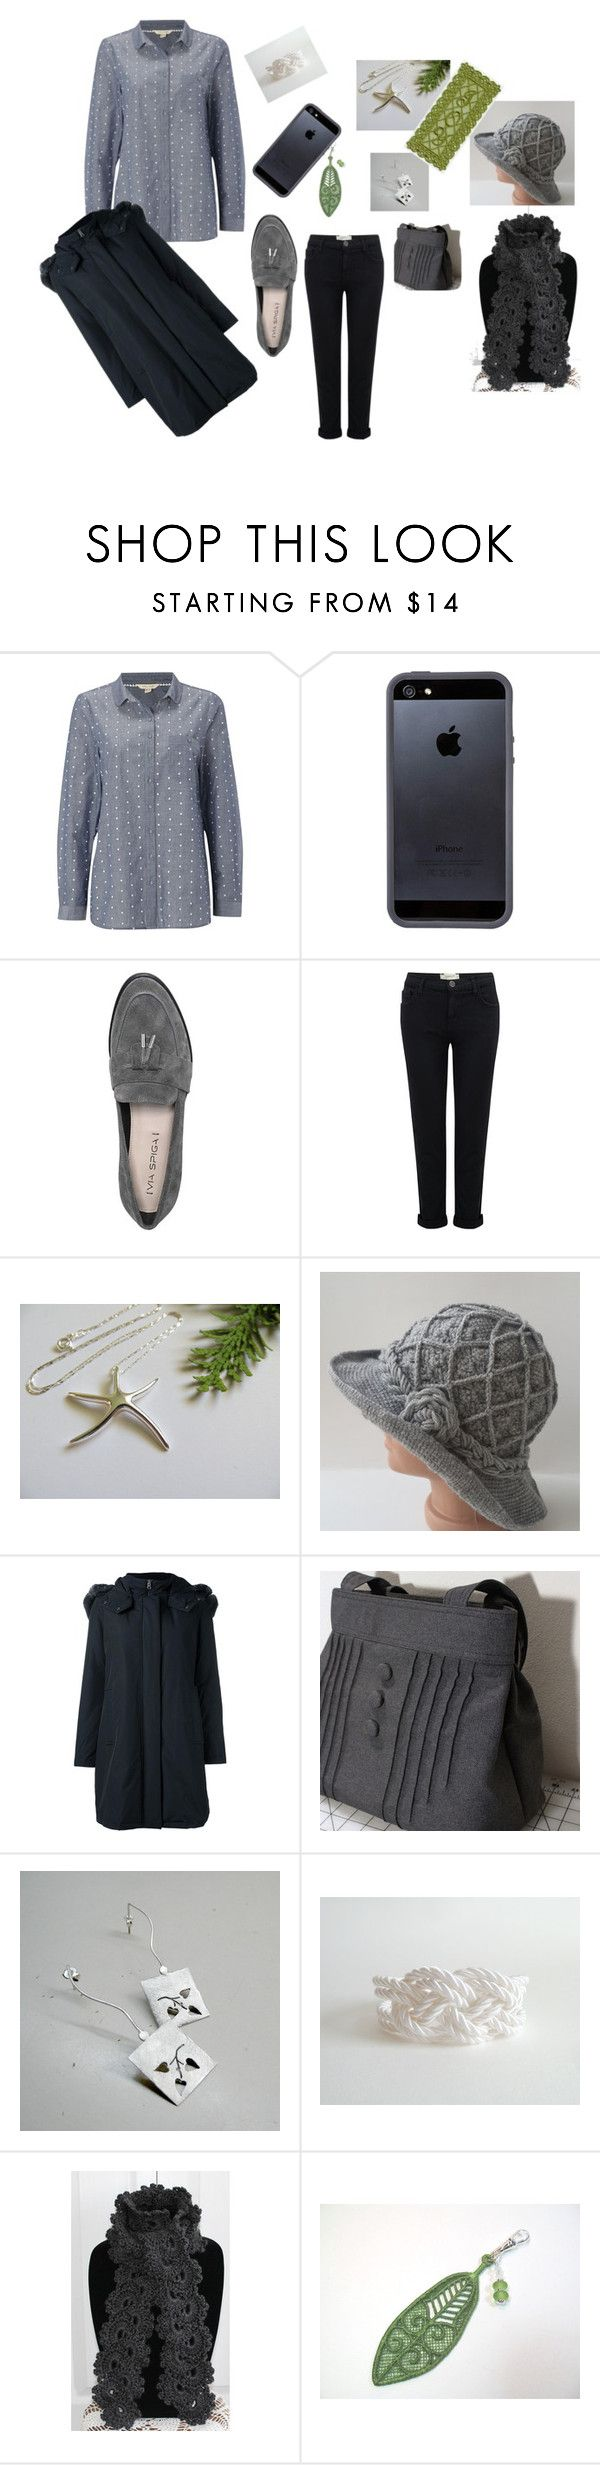 """Casual Wear for Her"" by keepsakedesignbycmm on Polyvore featuring White Stuff, Tavik Swimwear, Via Spiga, Current/Elliott, Woolrich and Satine"